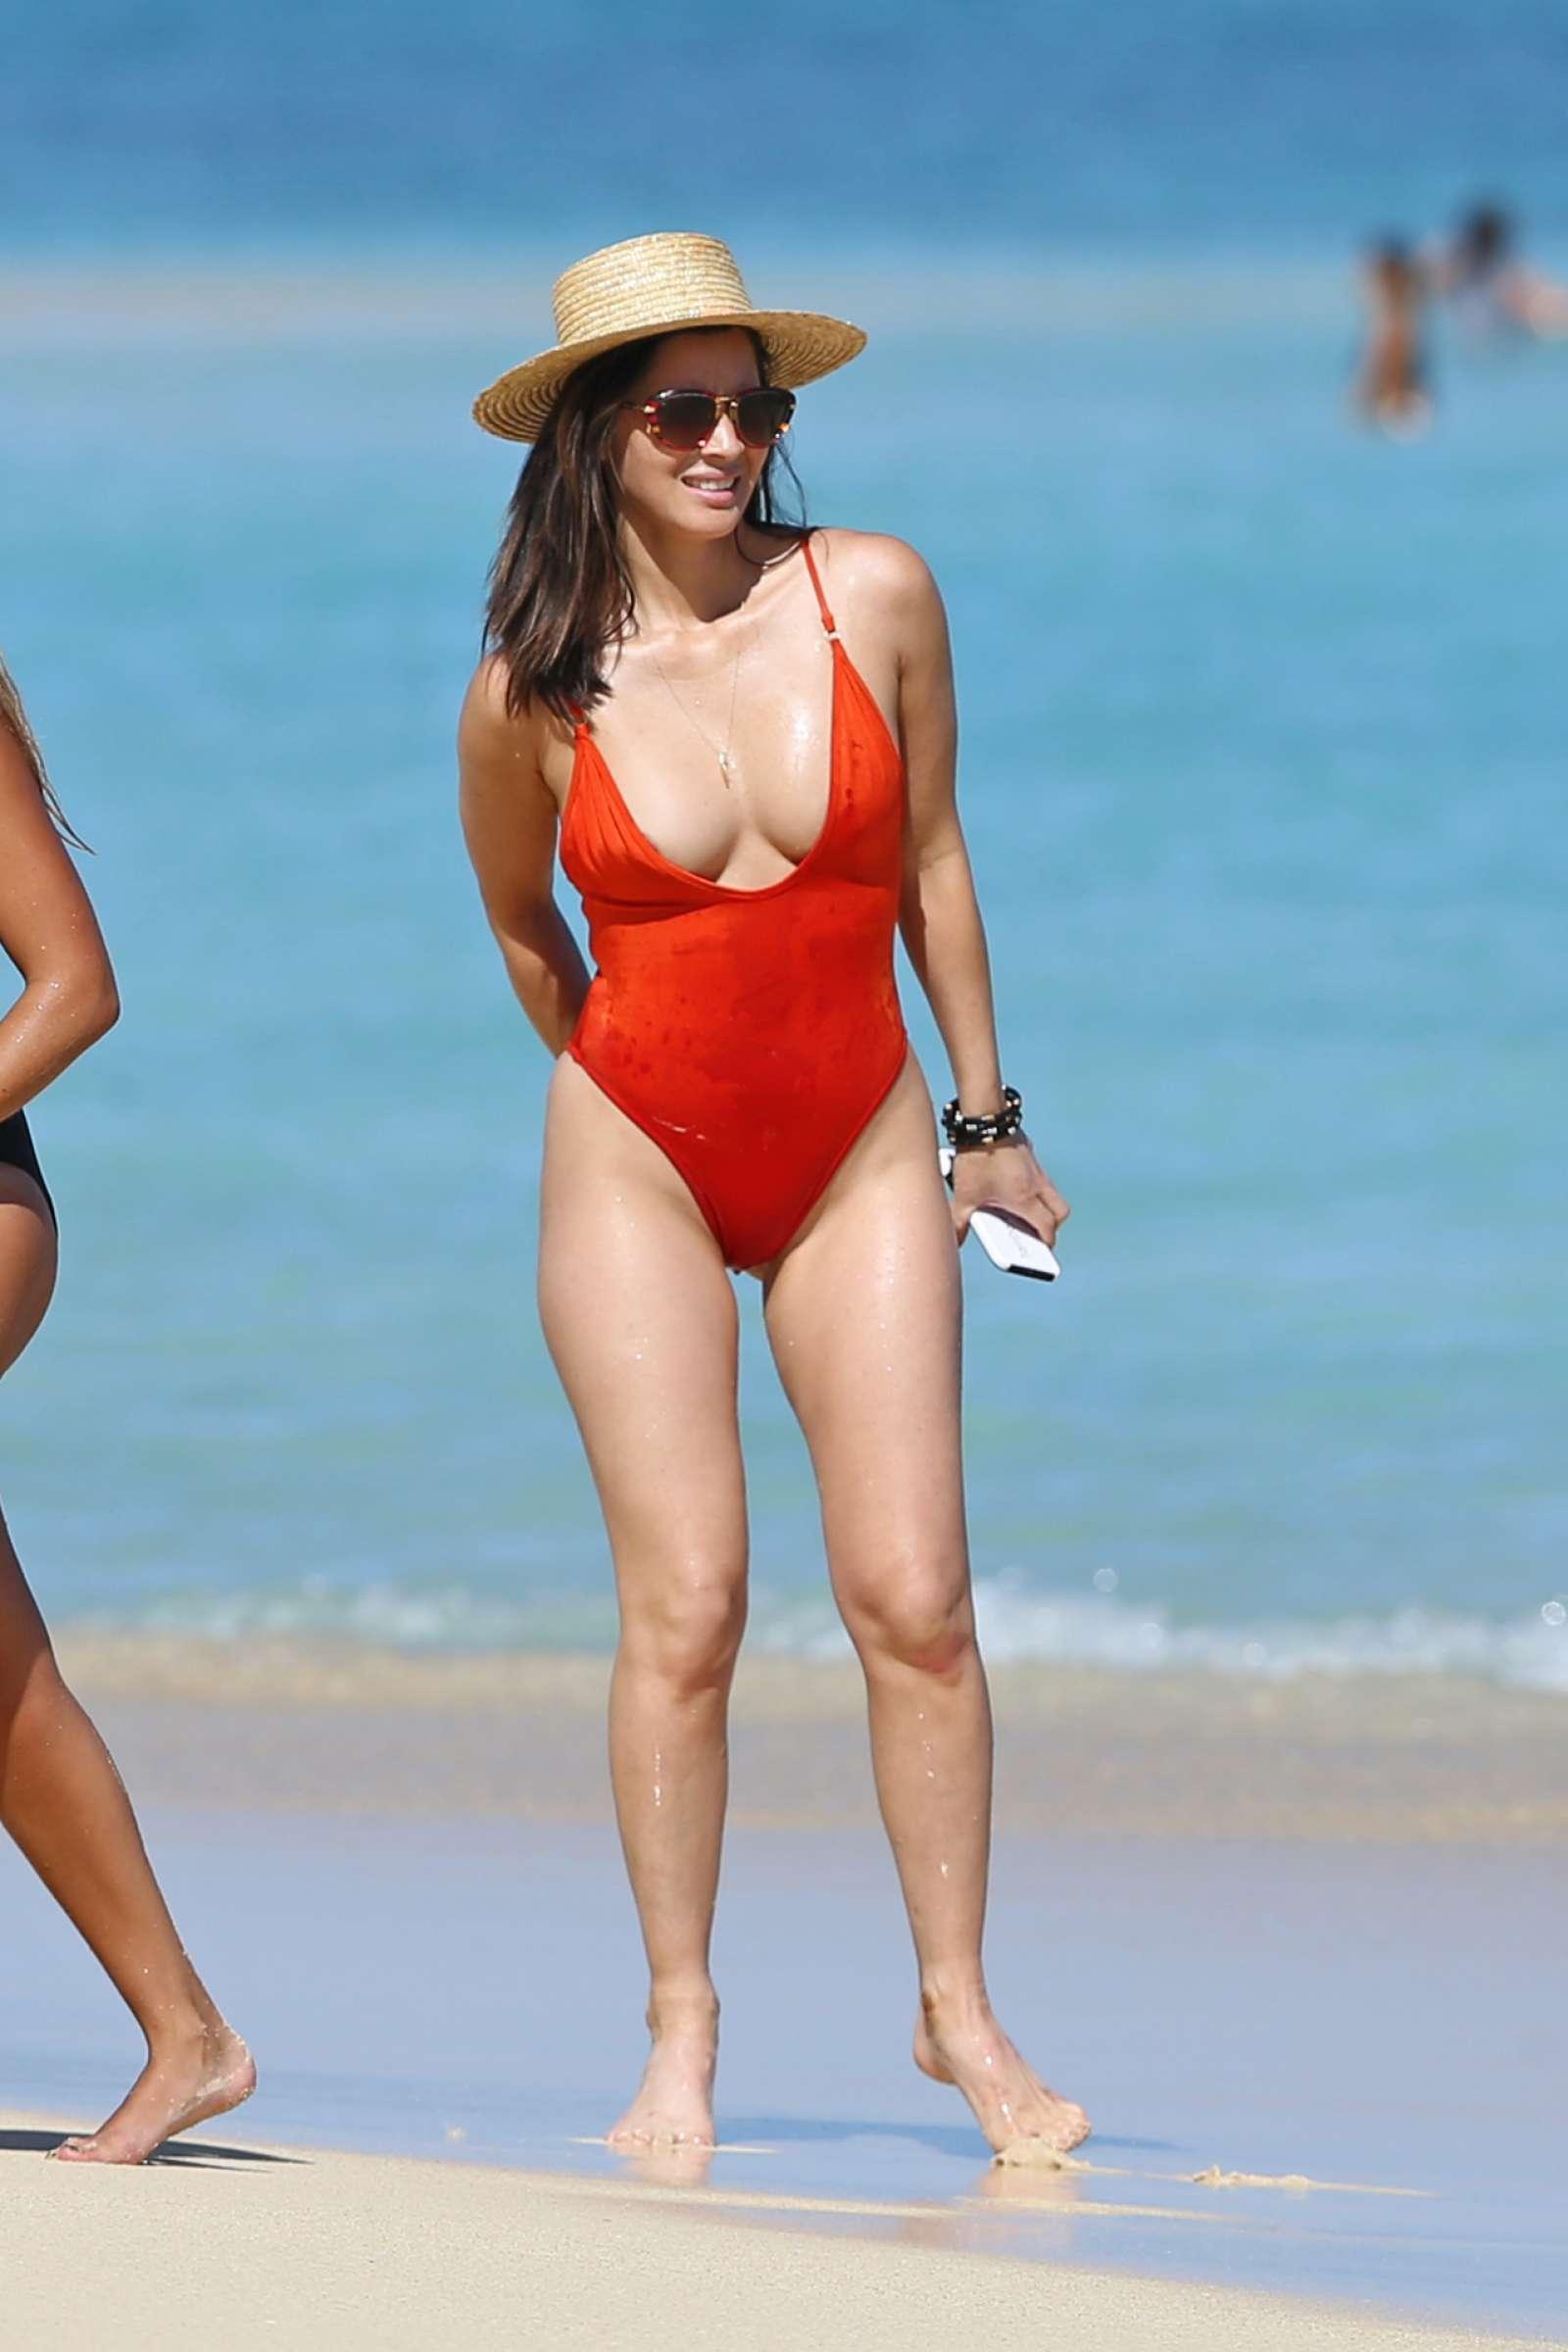 Bikini Olivia Munn naked (38 foto and video), Ass, Is a cute, Feet, braless 2015